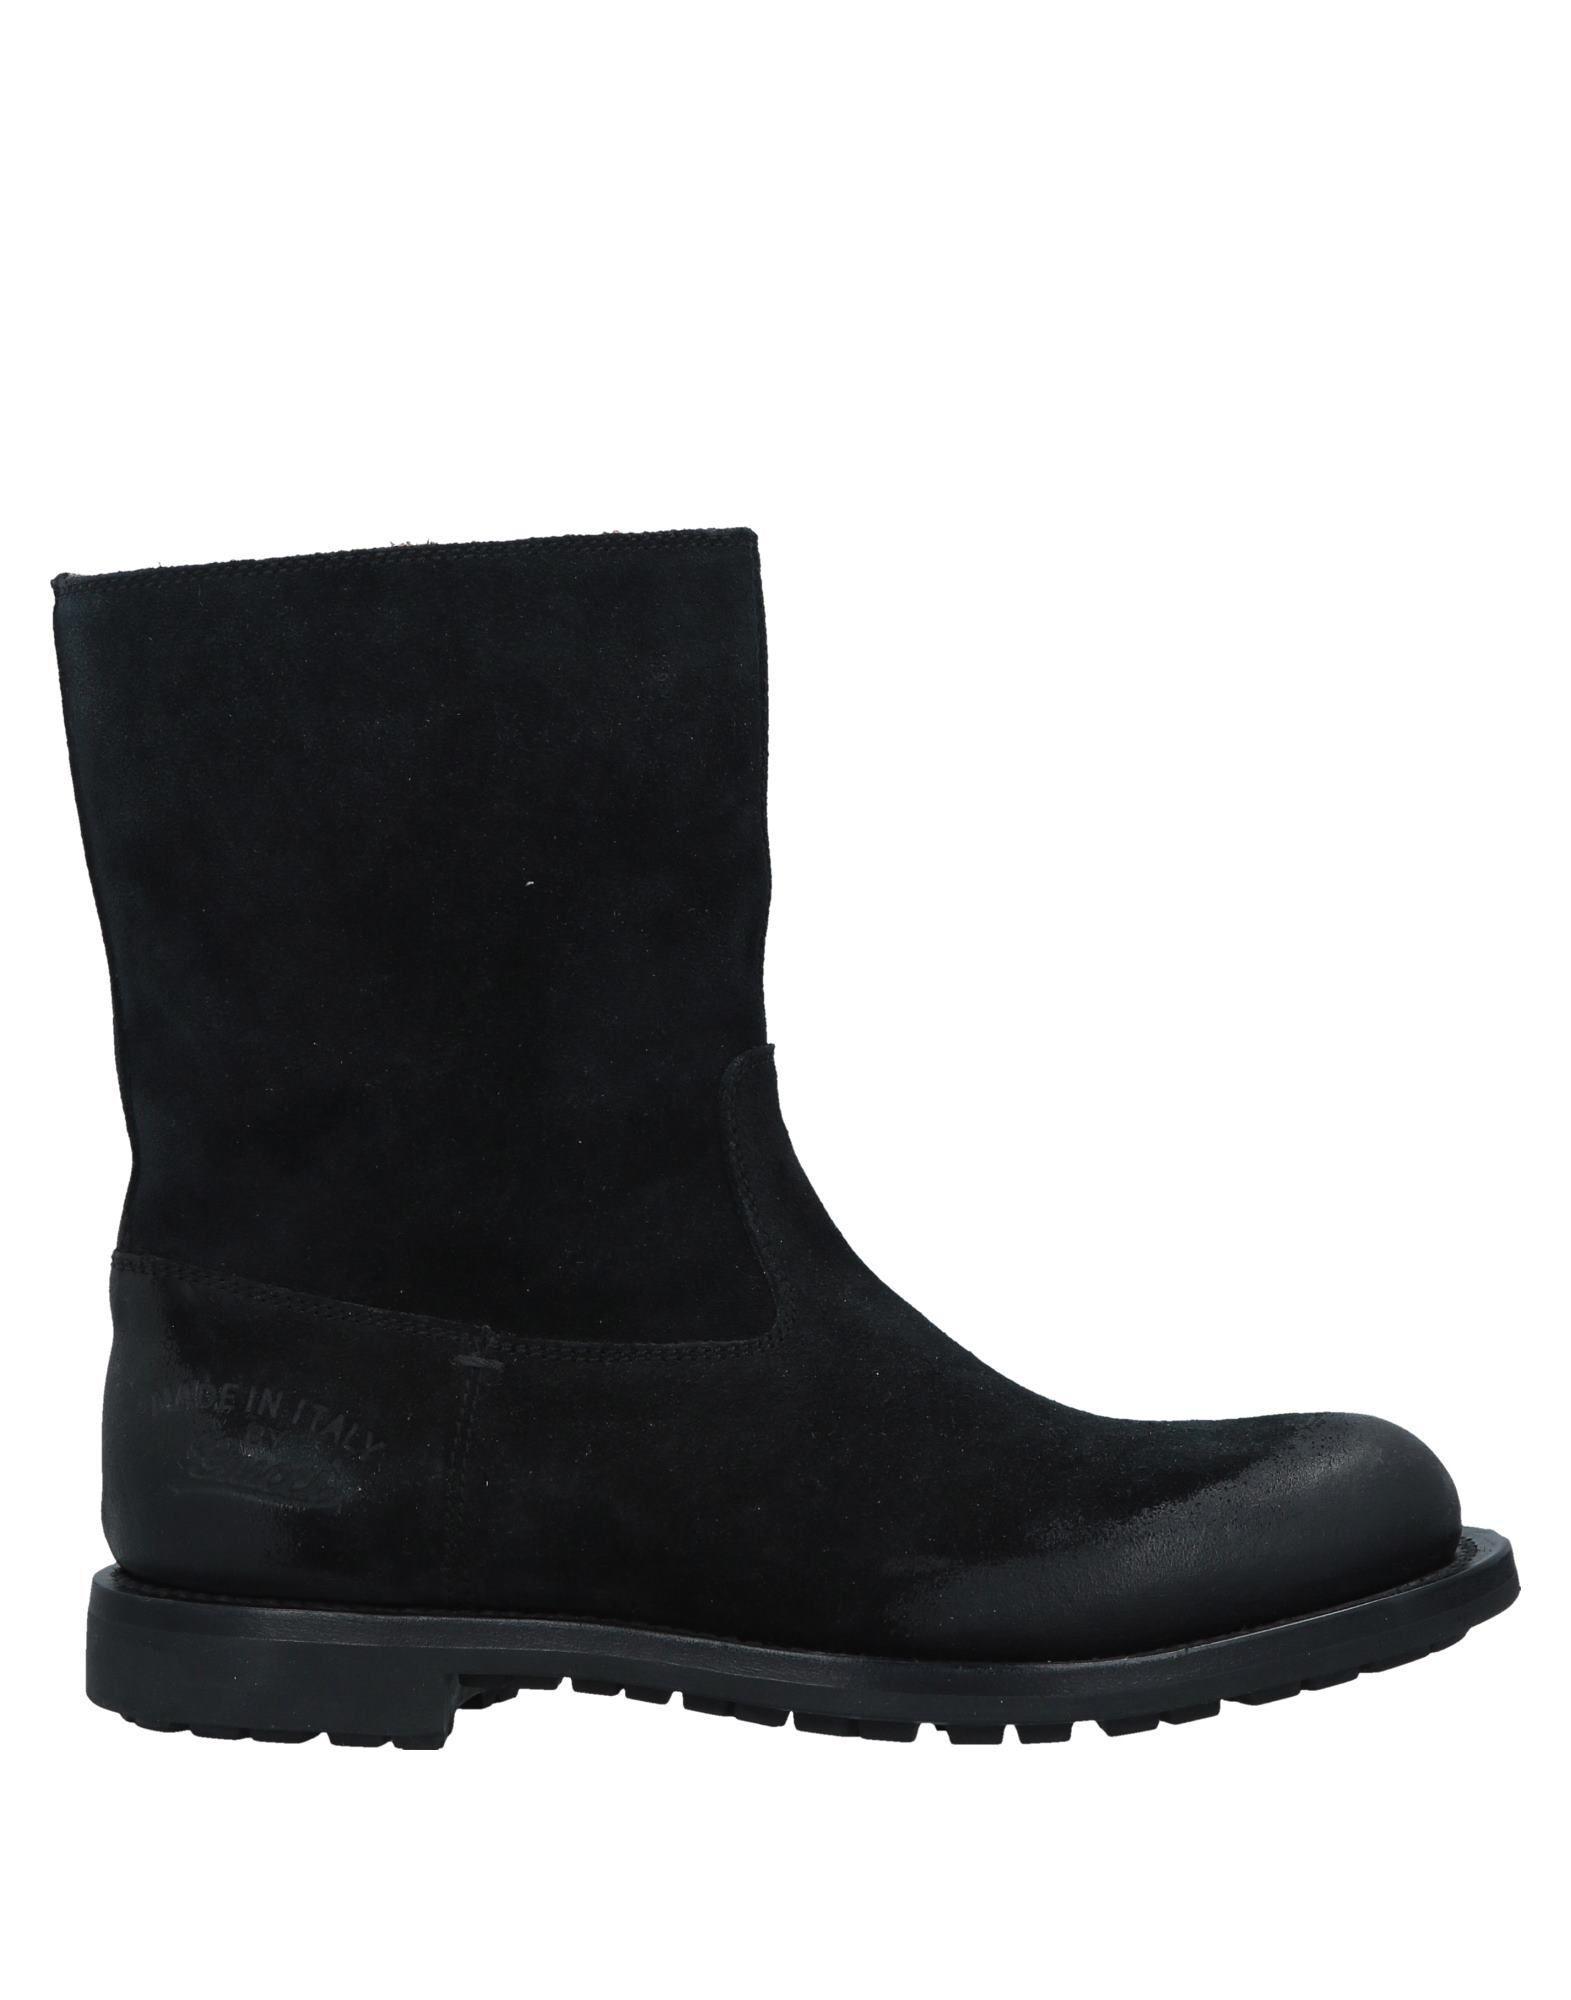 e40f14fa280 Lyst - Gucci Ankle Boots in Black for Men